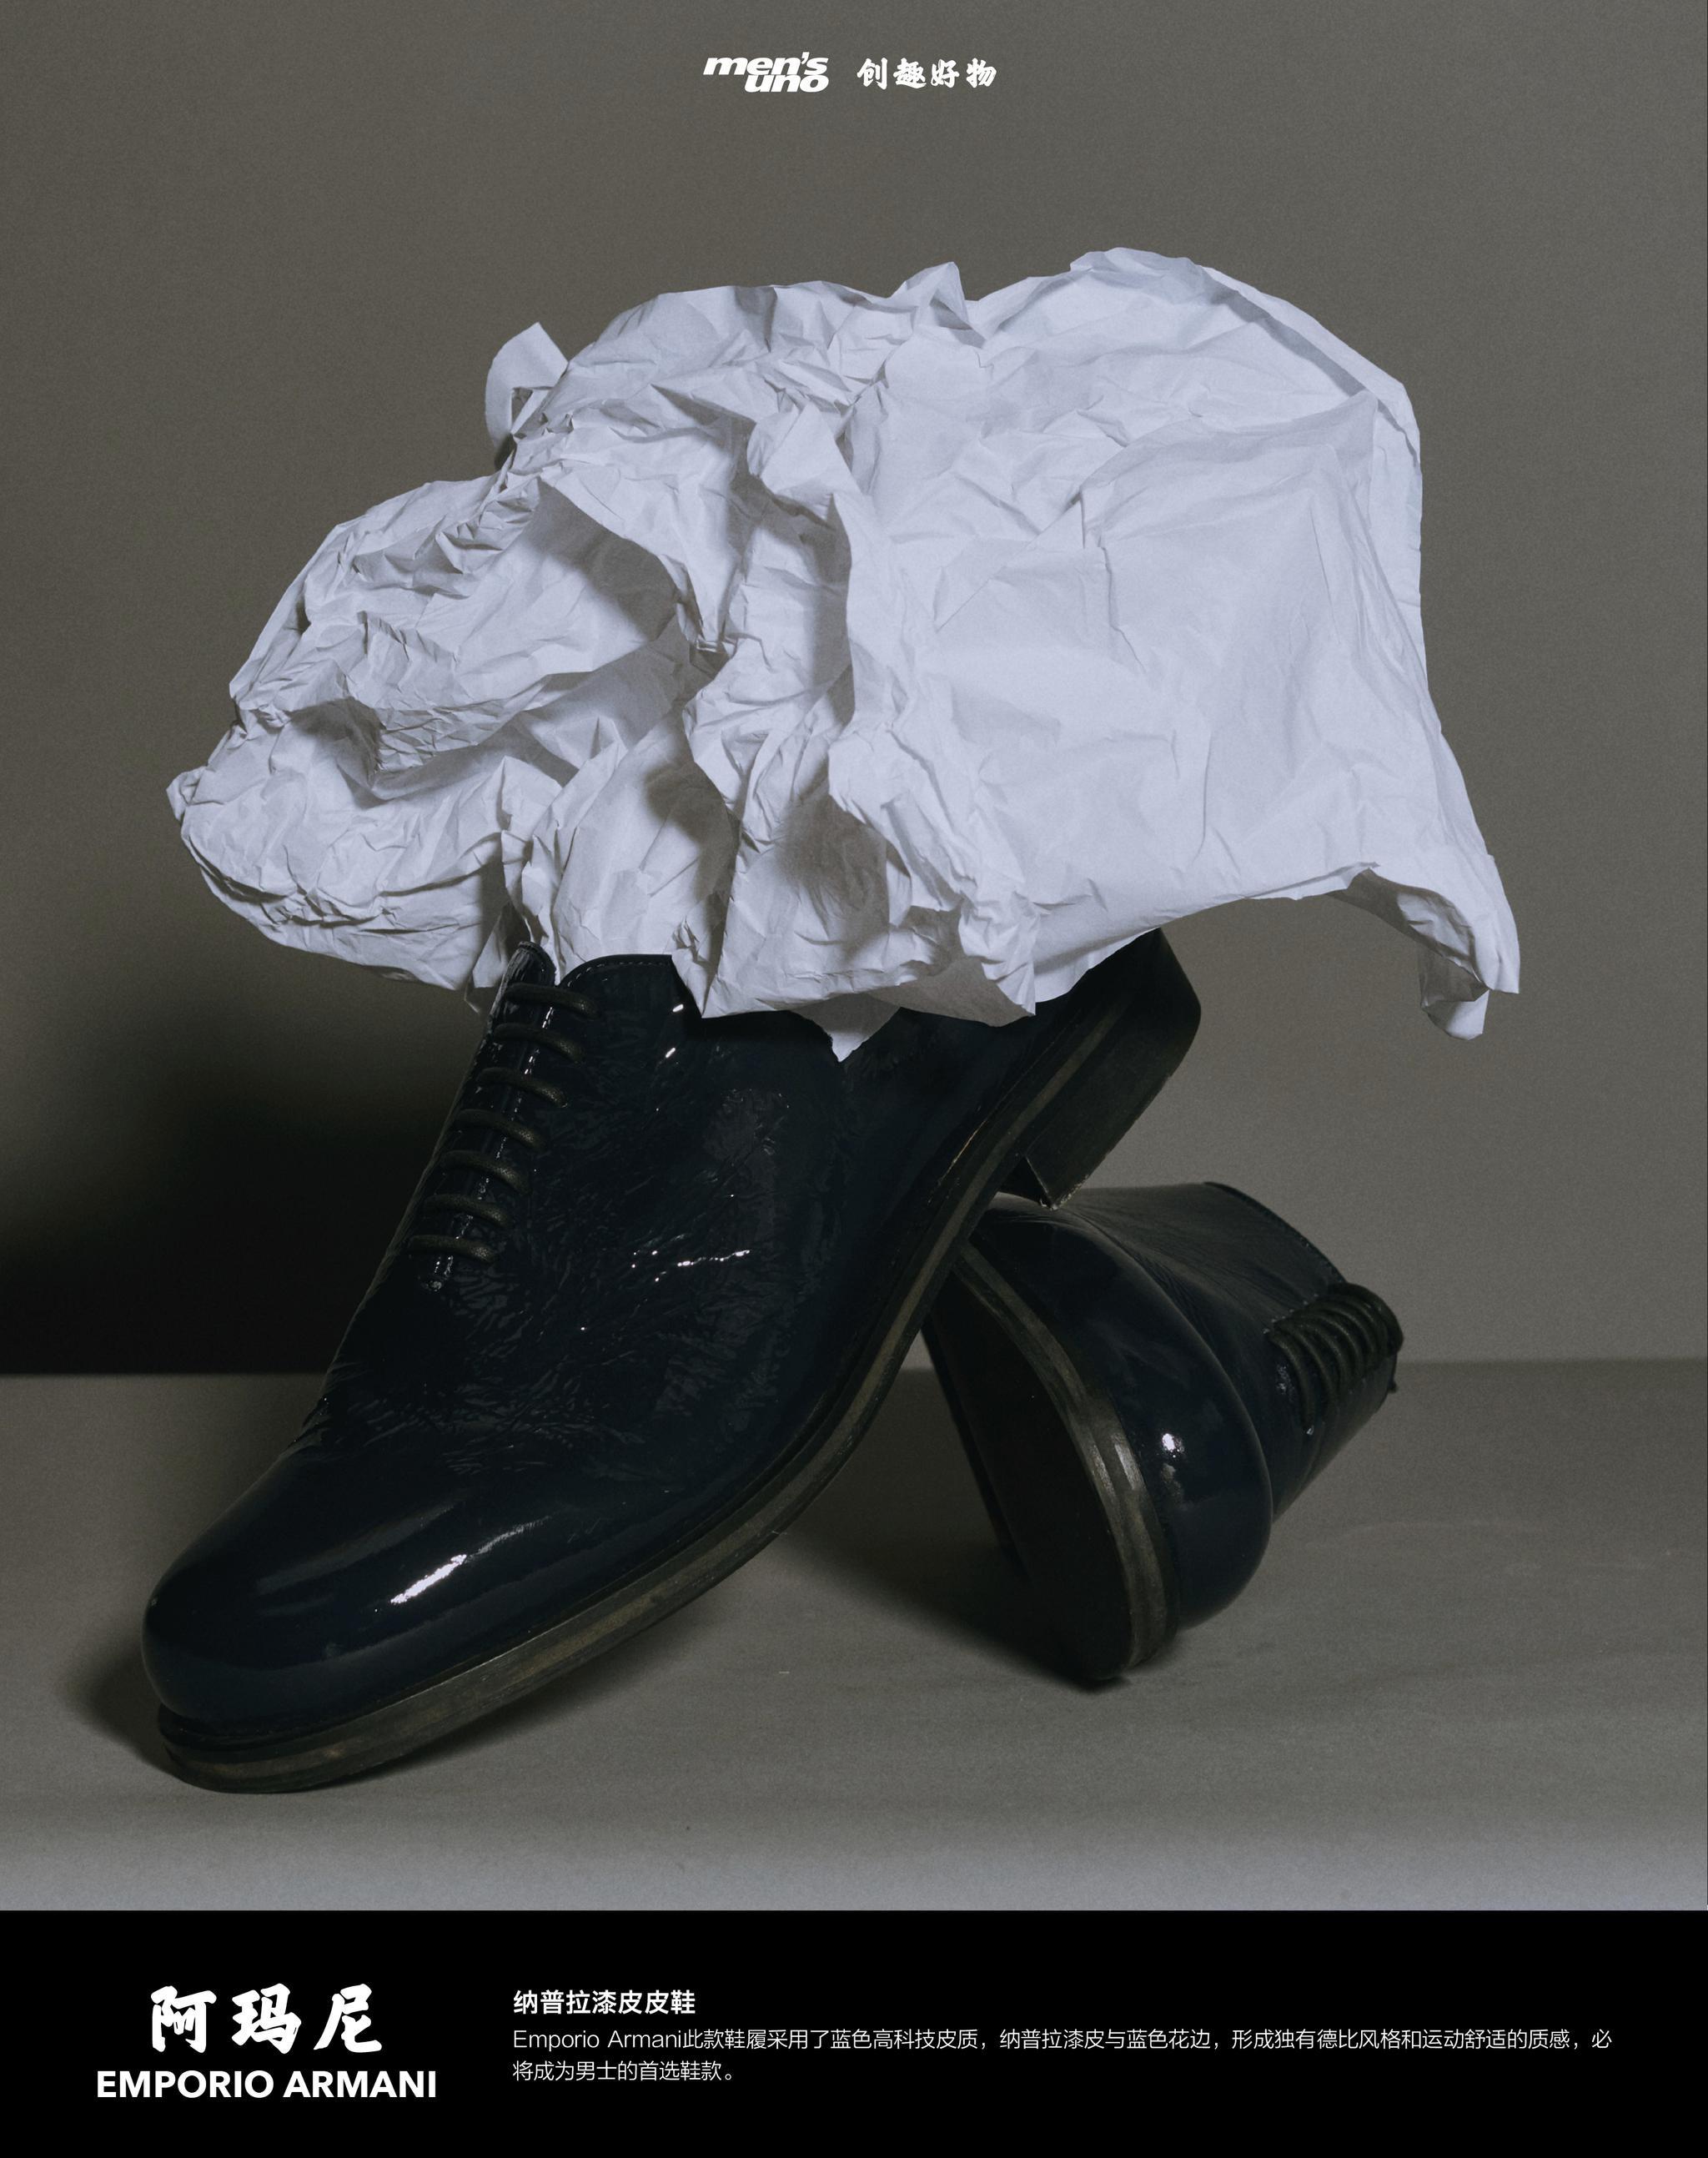 Emporio Armani此款鞋履采用了蓝色高科技皮质……